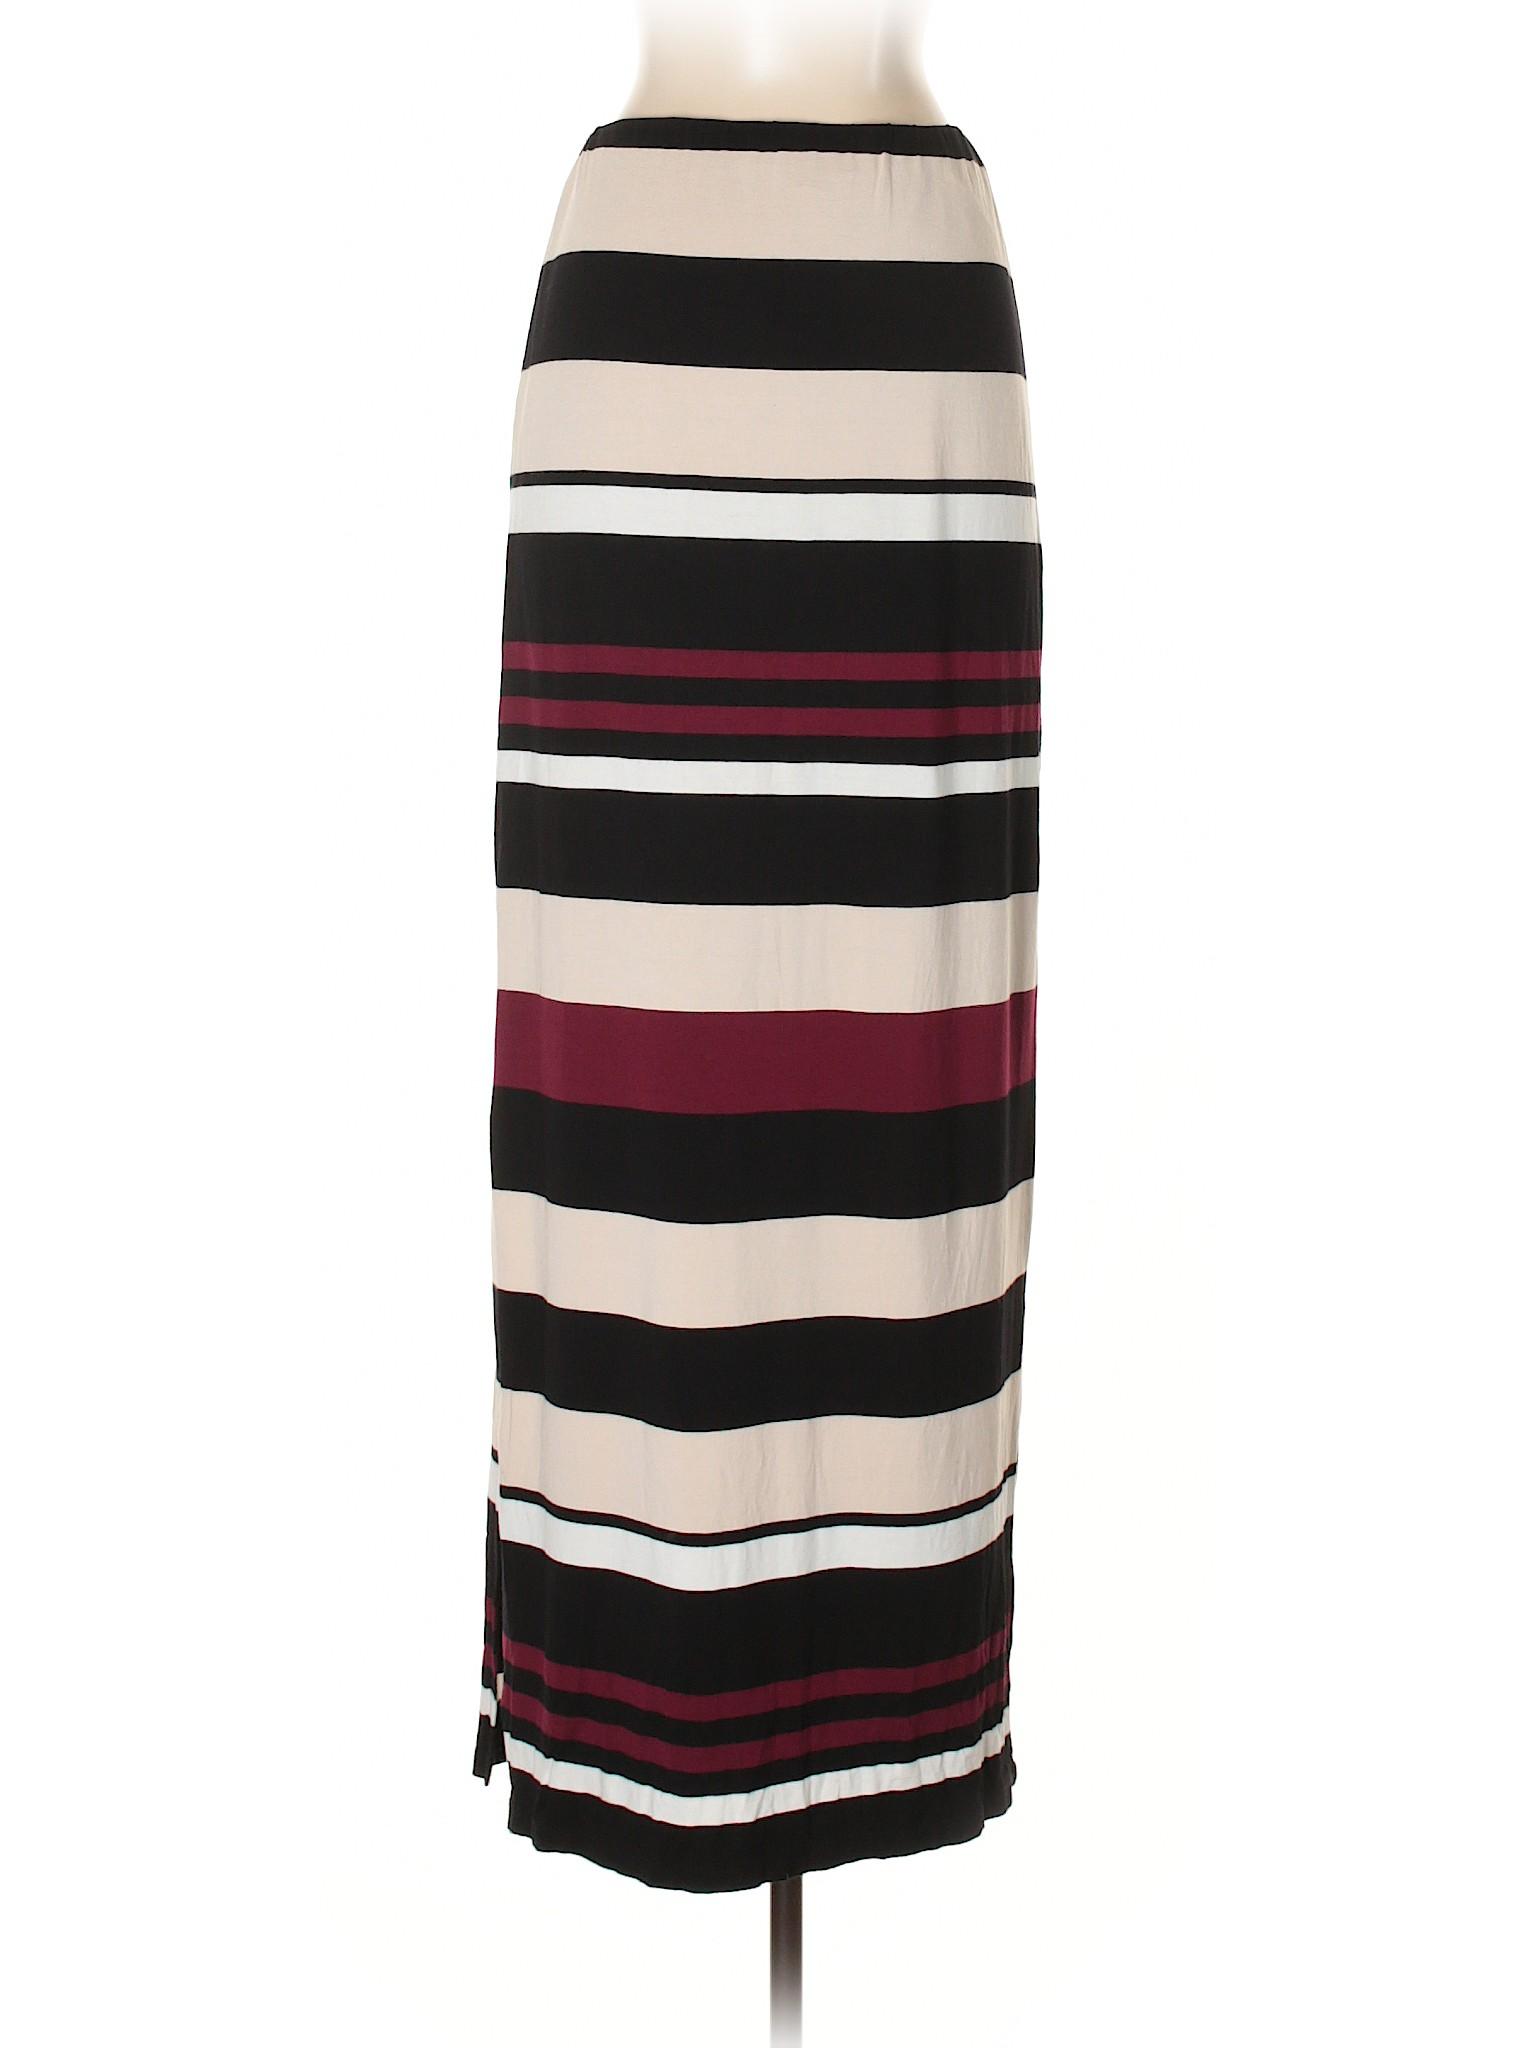 Boutique Skirt Casual Boutique Casual Skirt Casual Skirt Skirt Boutique Boutique Casual XxwqYUtt